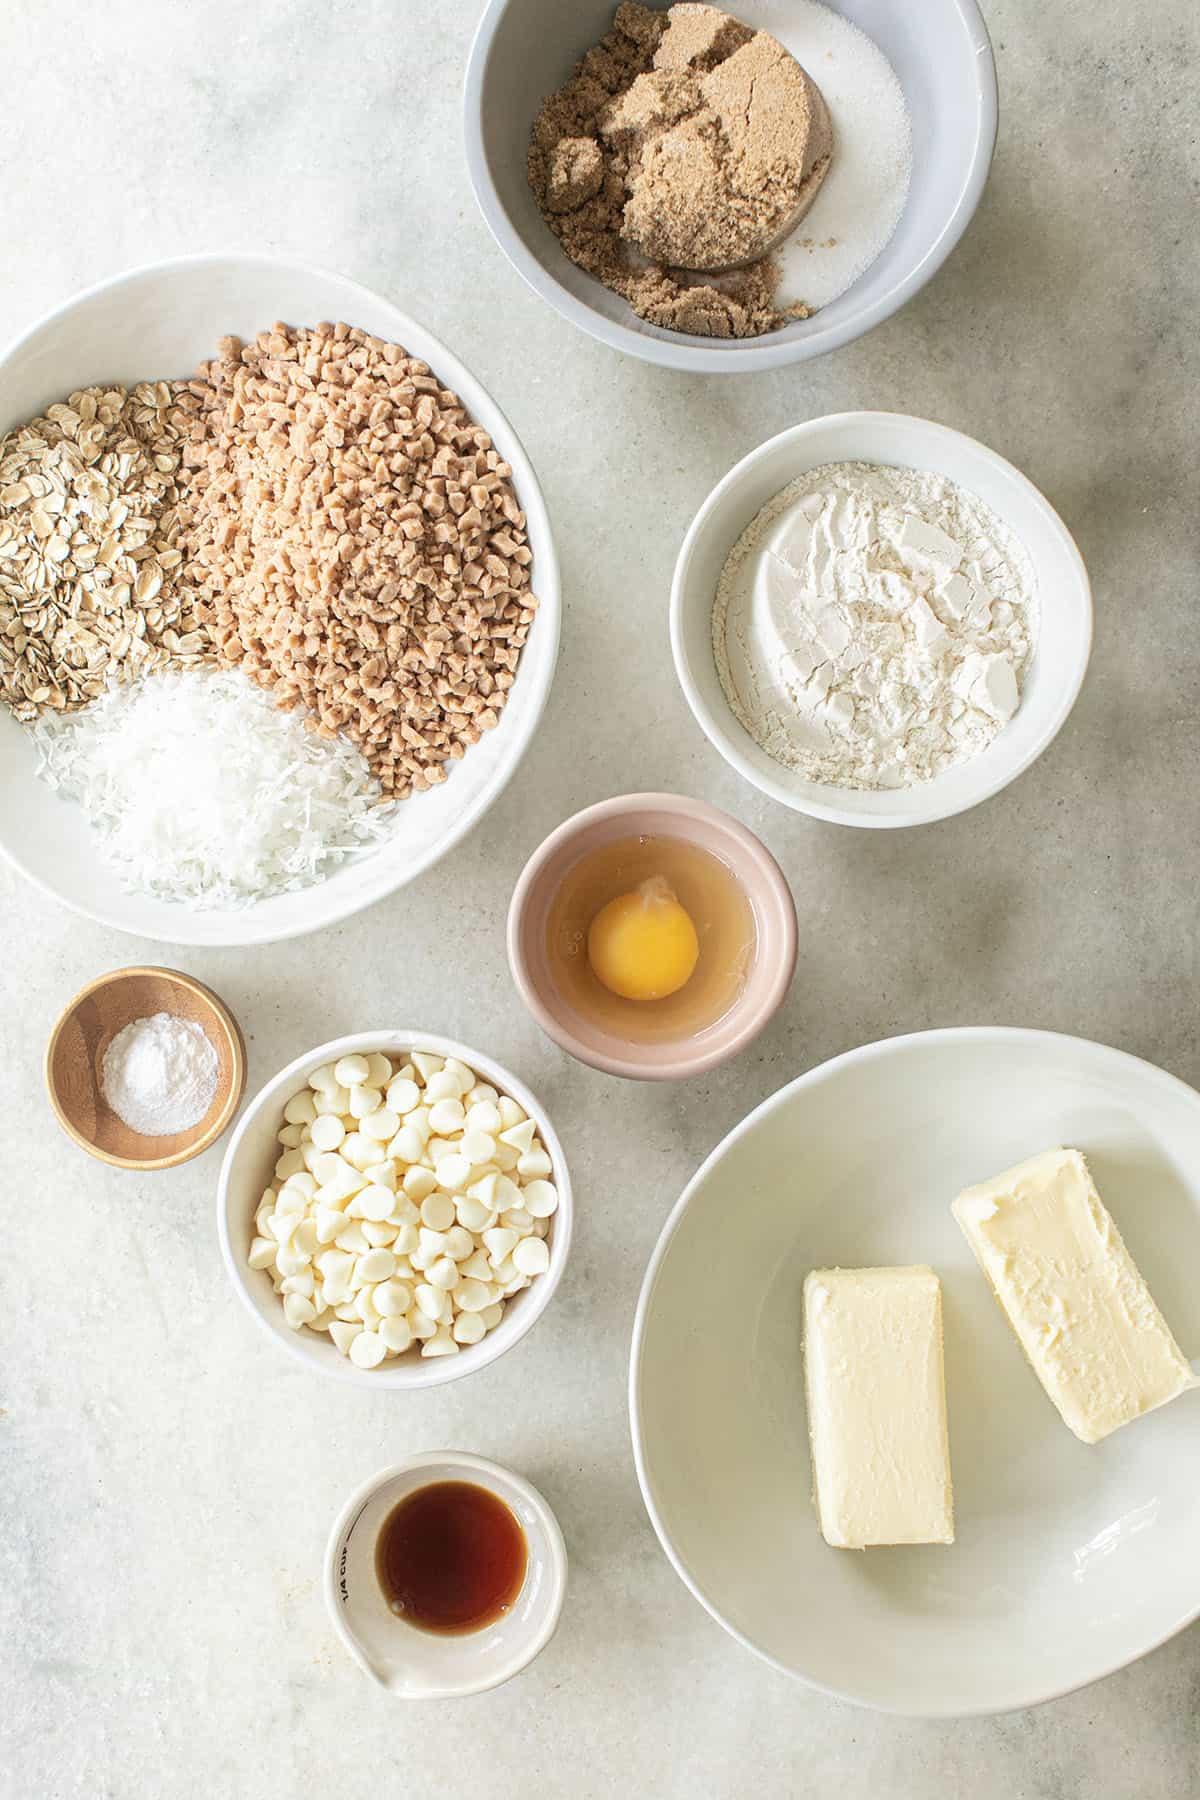 ingredients to make kitchen sink cookies